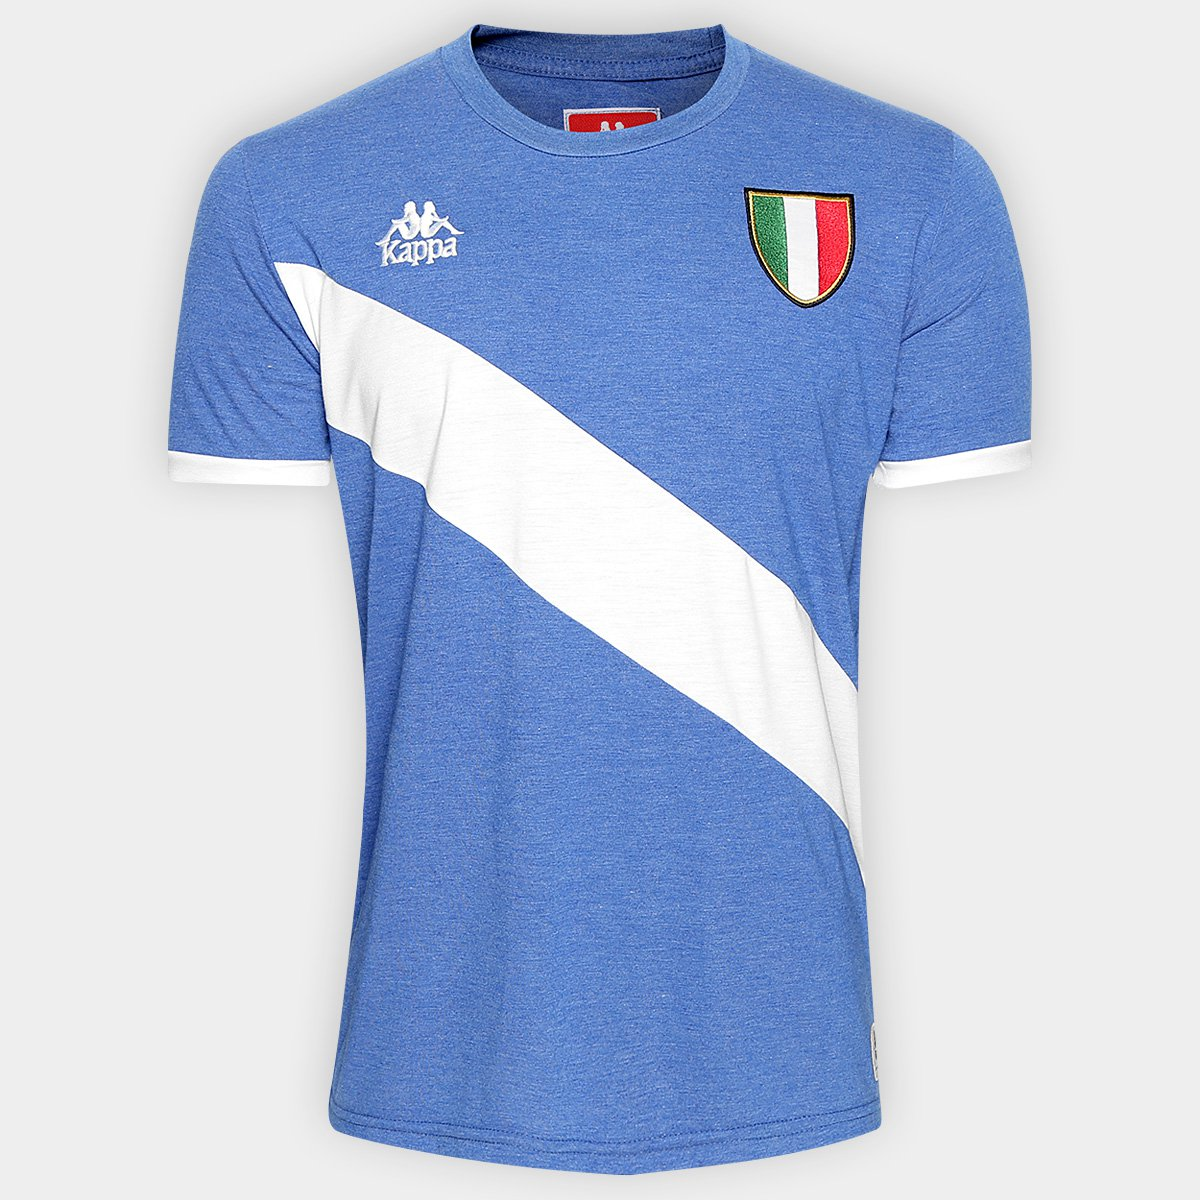 a8d8fcbdaaa4d Camiseta Itália Kappa Masculina - Compre Agora